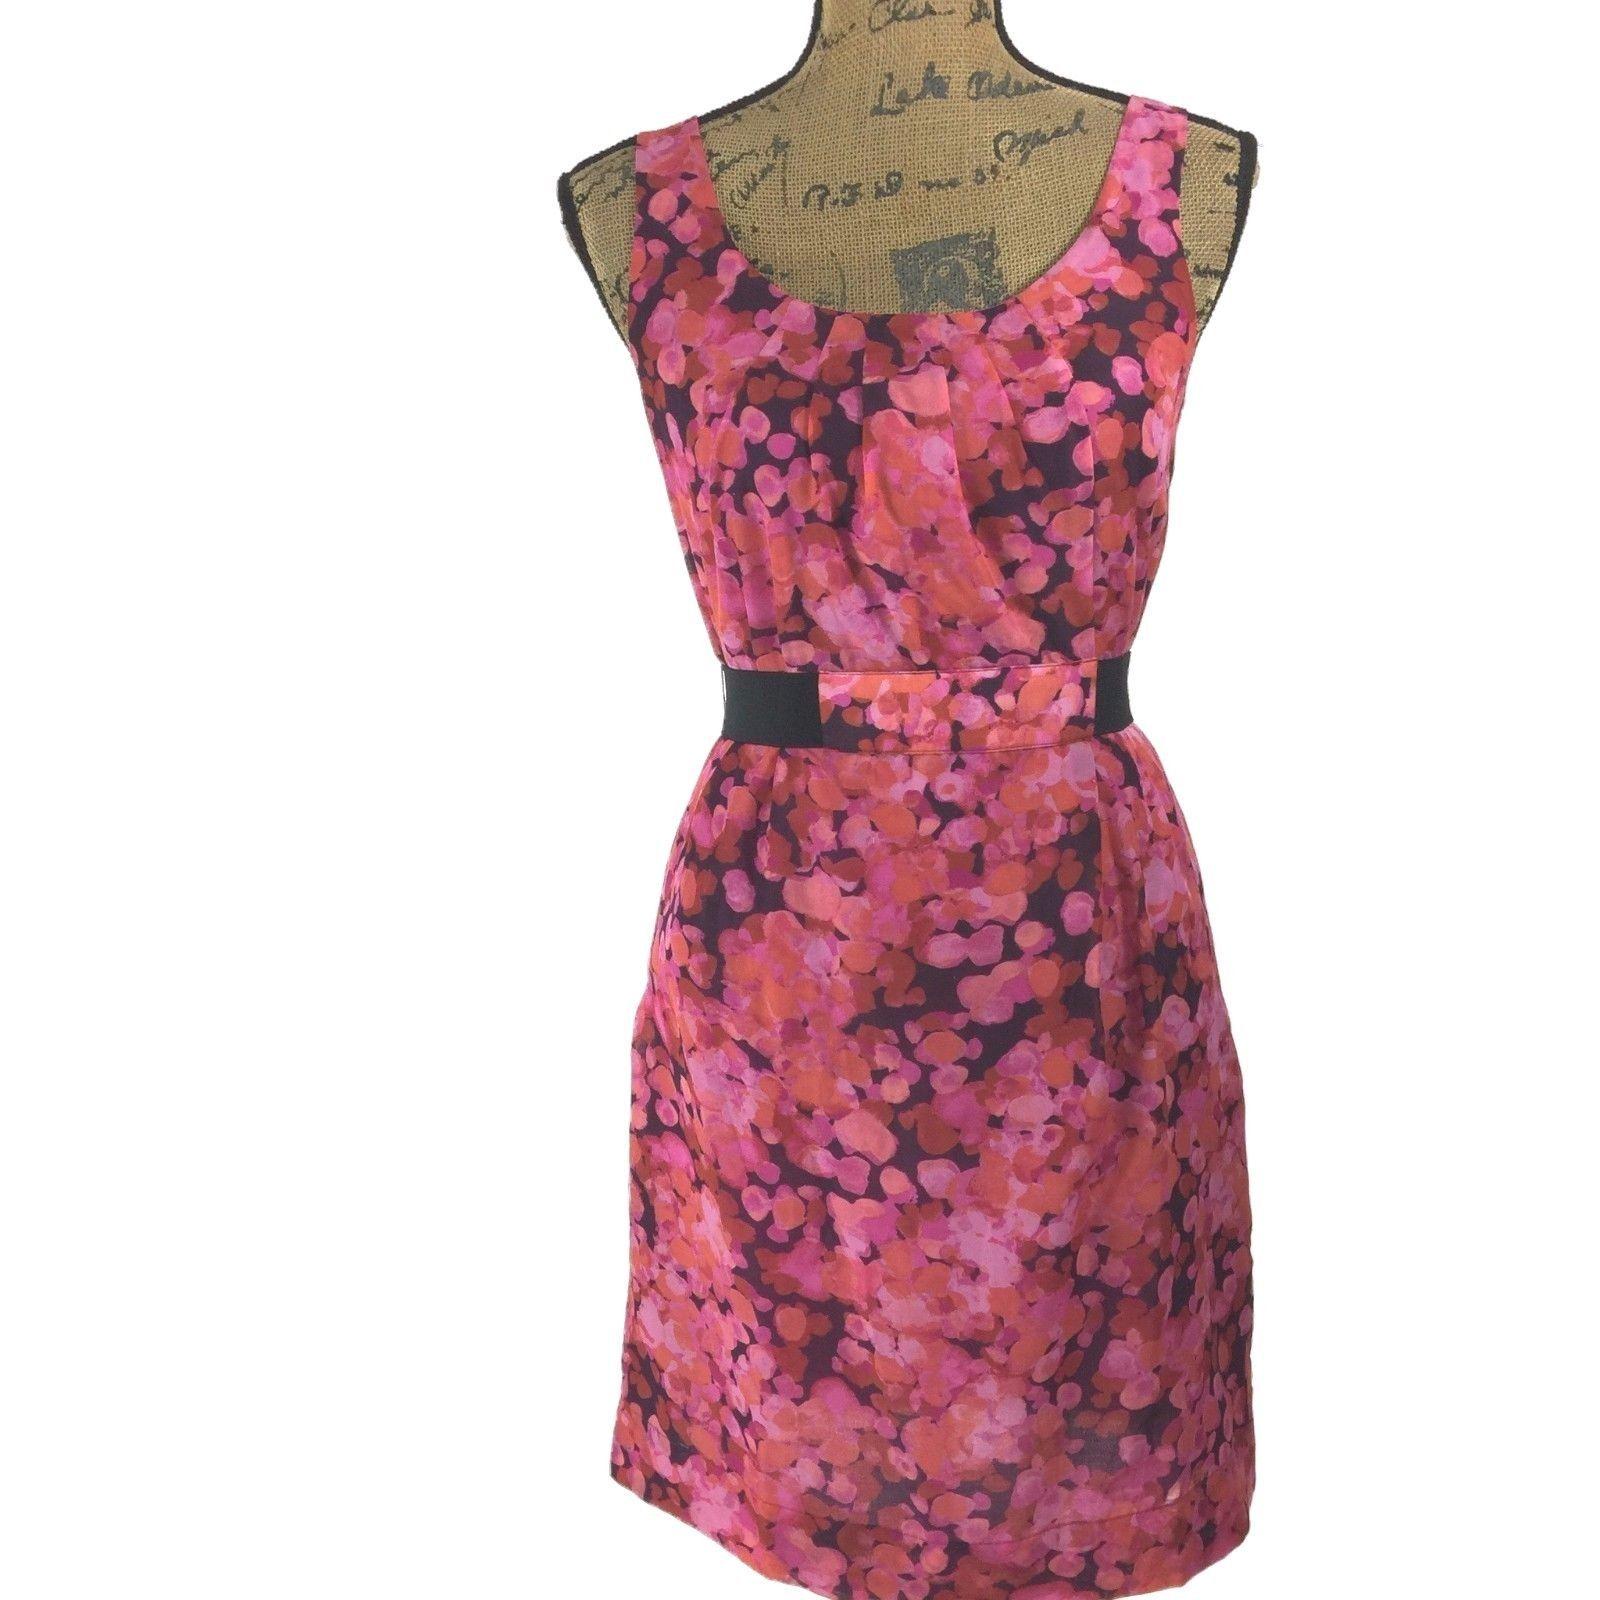 SET Ann Taylor LOFT Dress J.Crew Clare Cardigan Sweater Pink Purple Black 2 S LN image 2